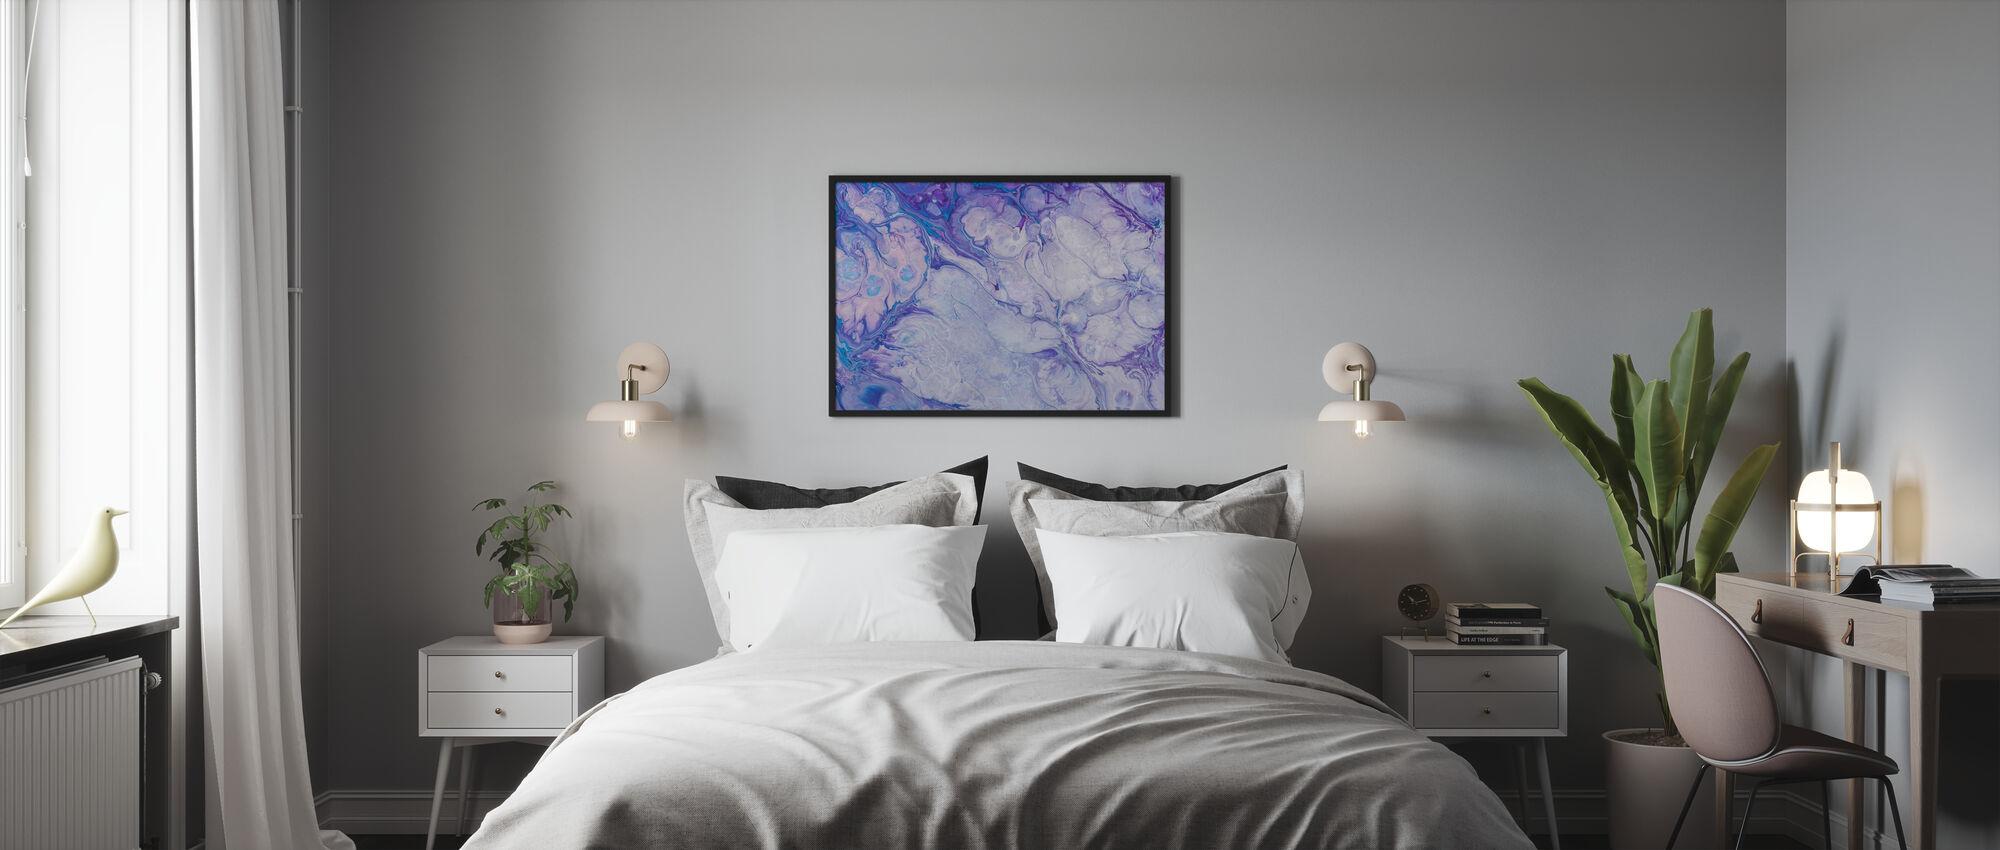 Blue Flower Pattern - Poster - Bedroom